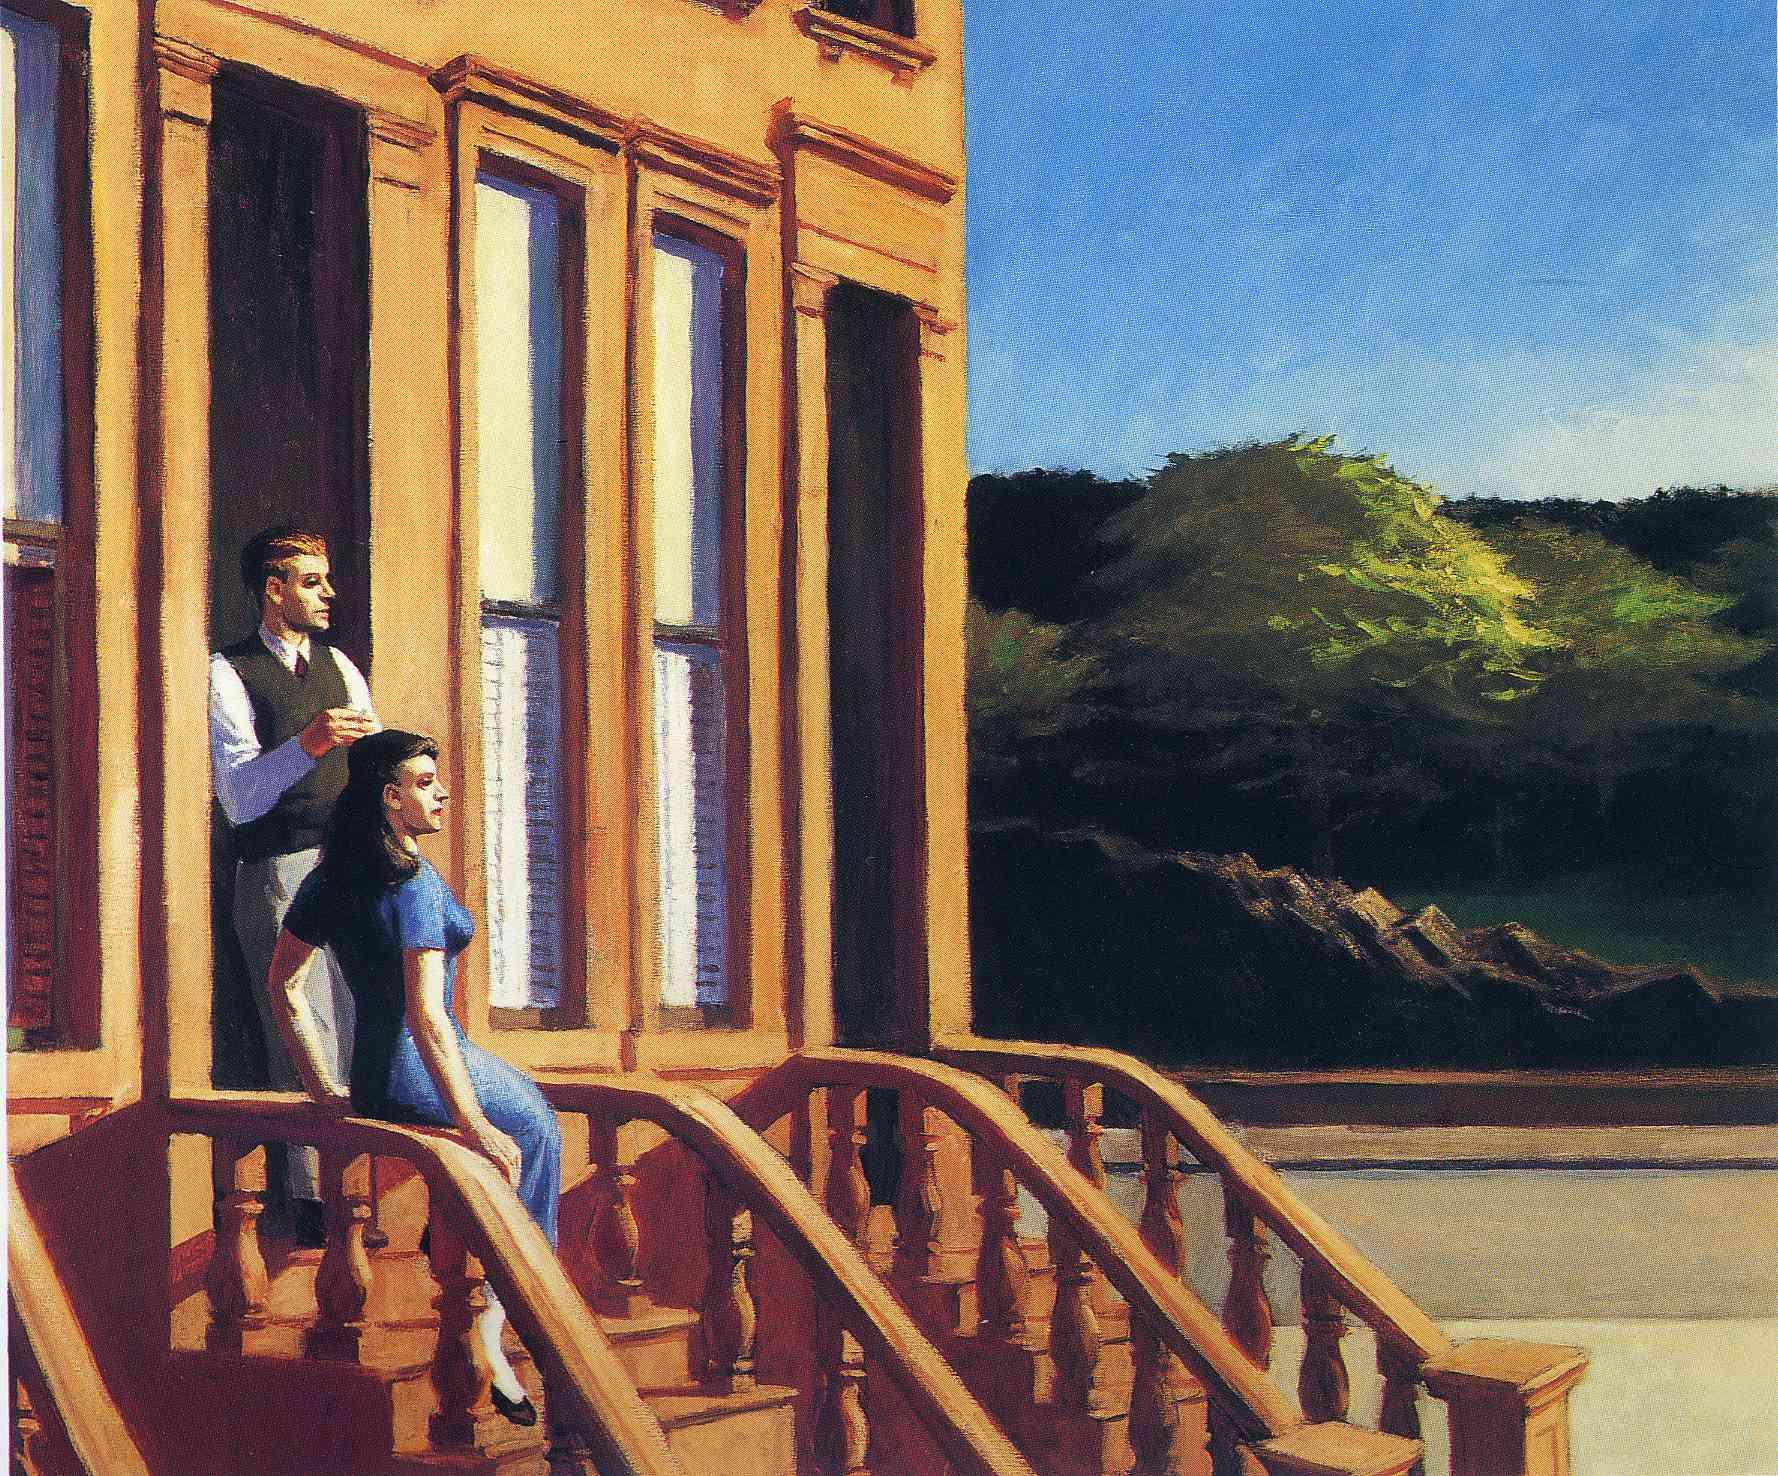 Sunlight on Brownstones, 1956